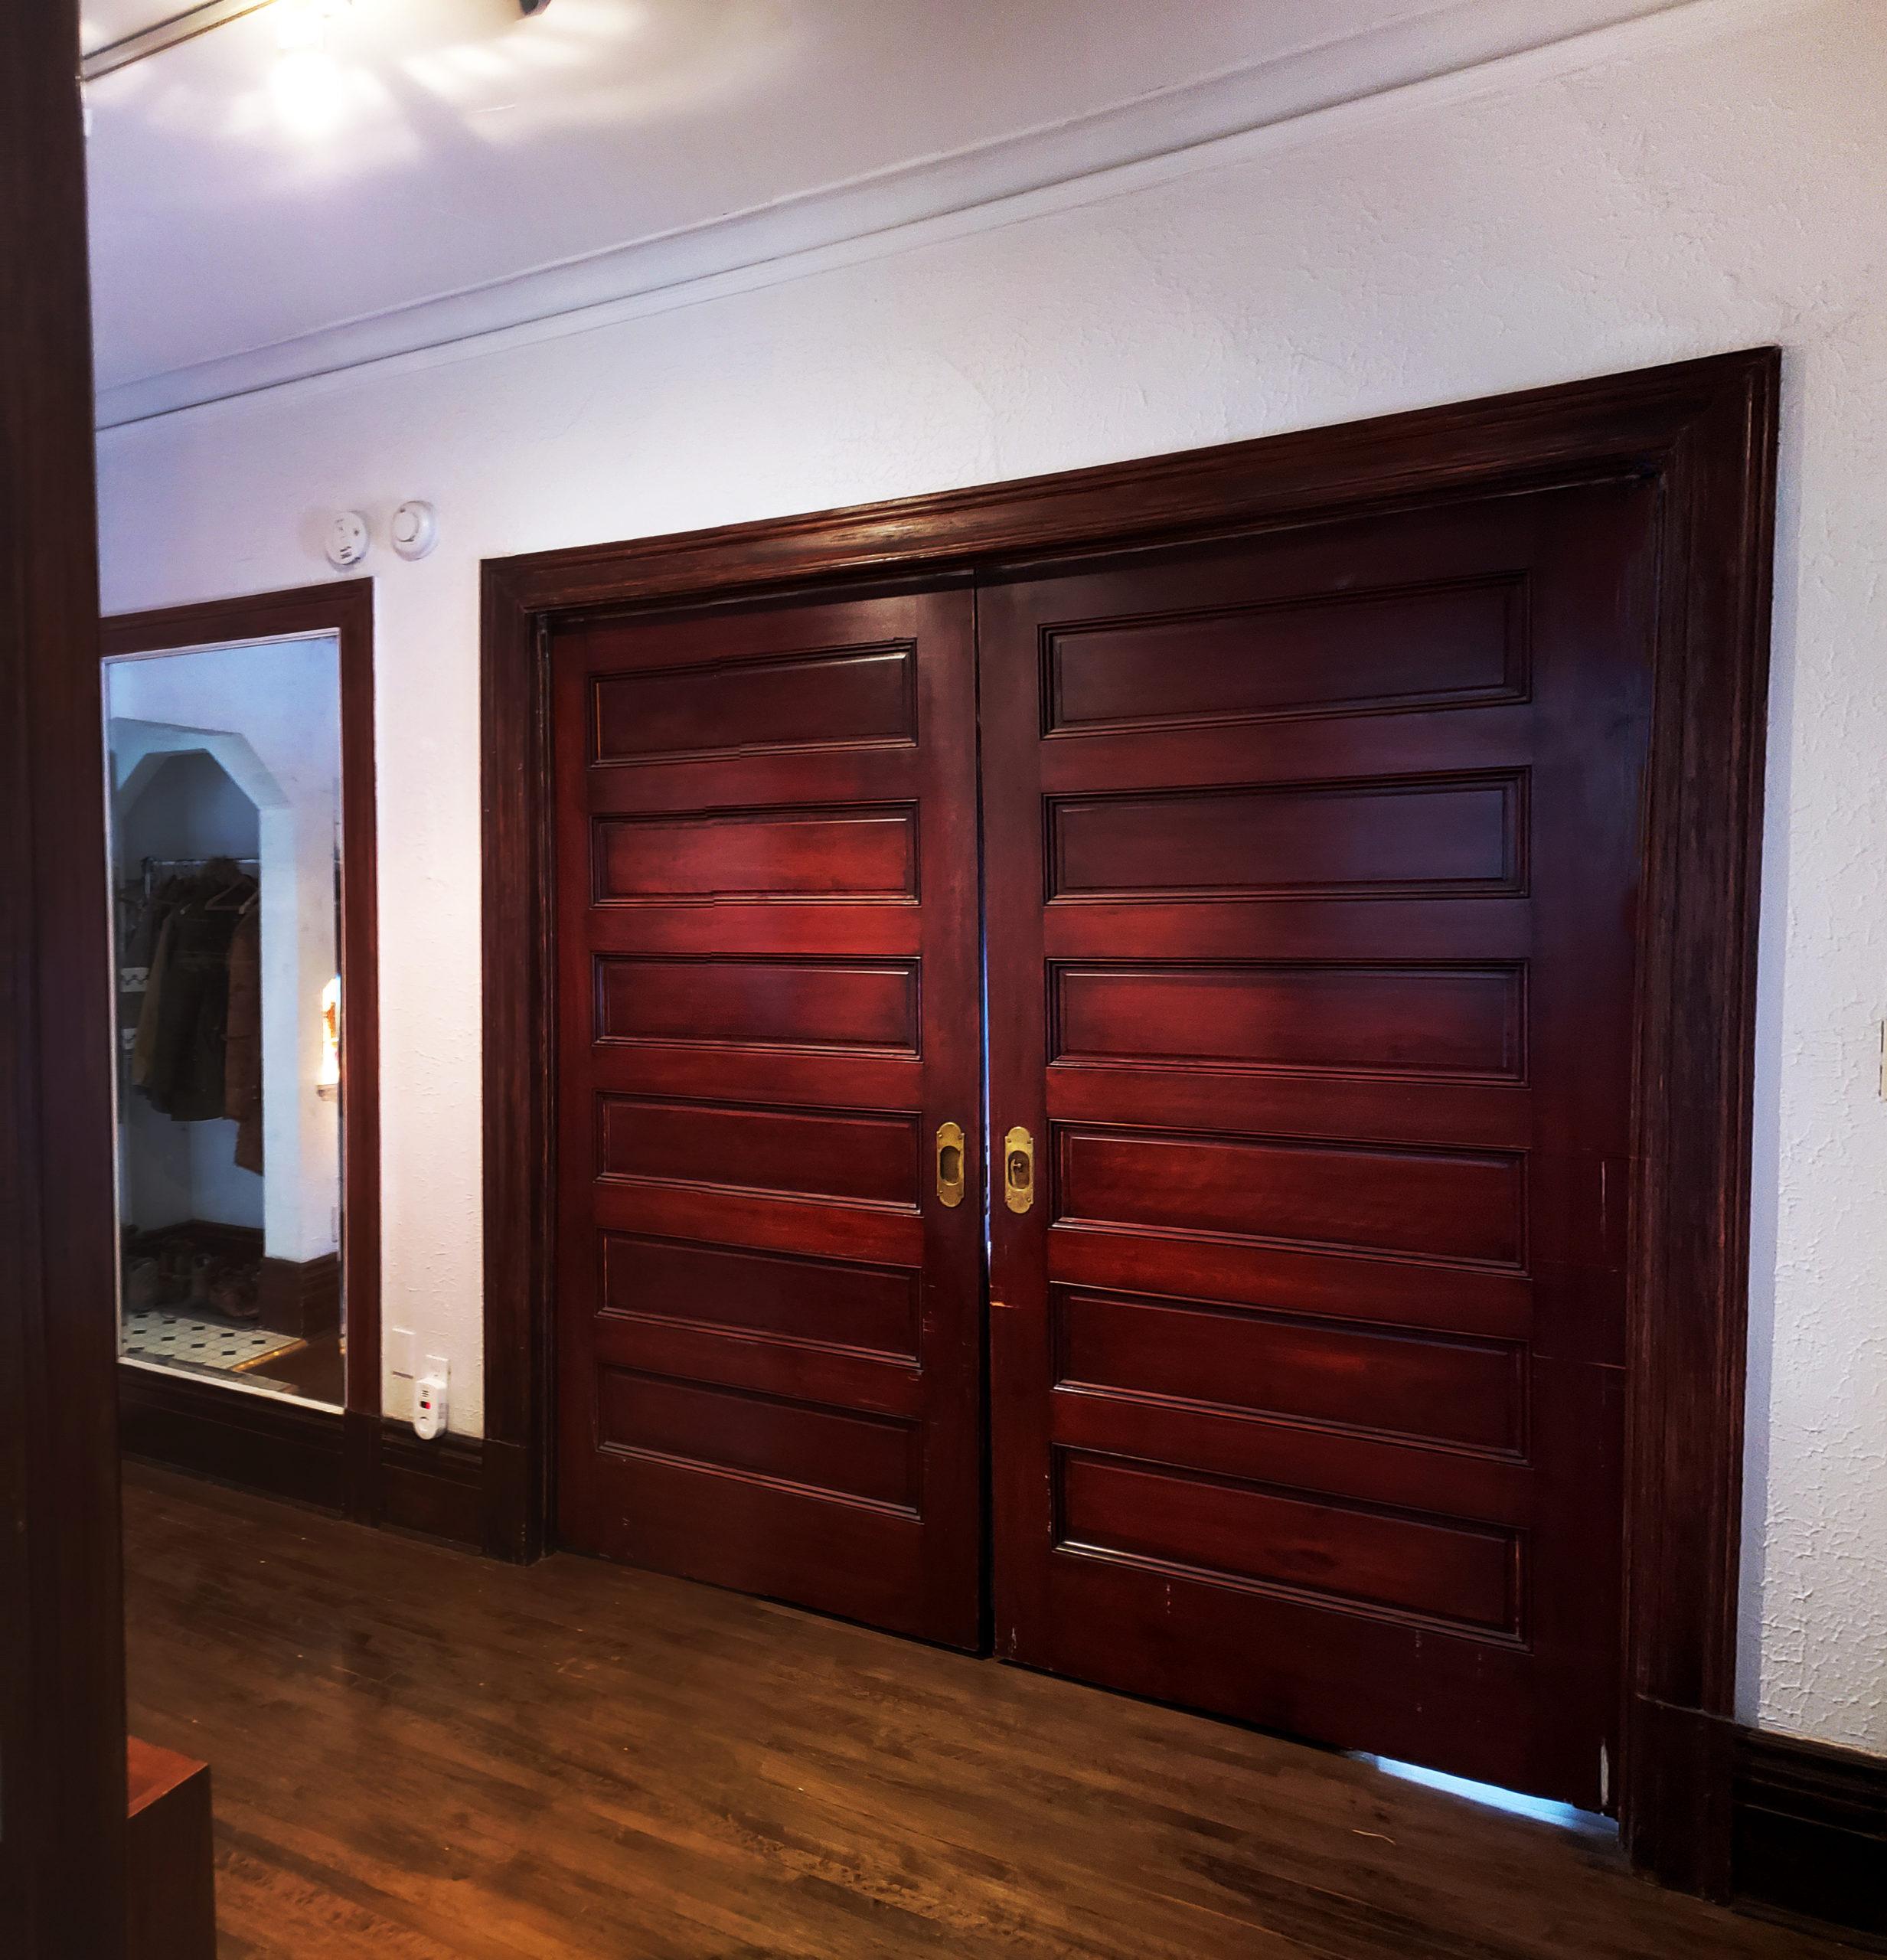 Bracken House - solid oak pocket doors.